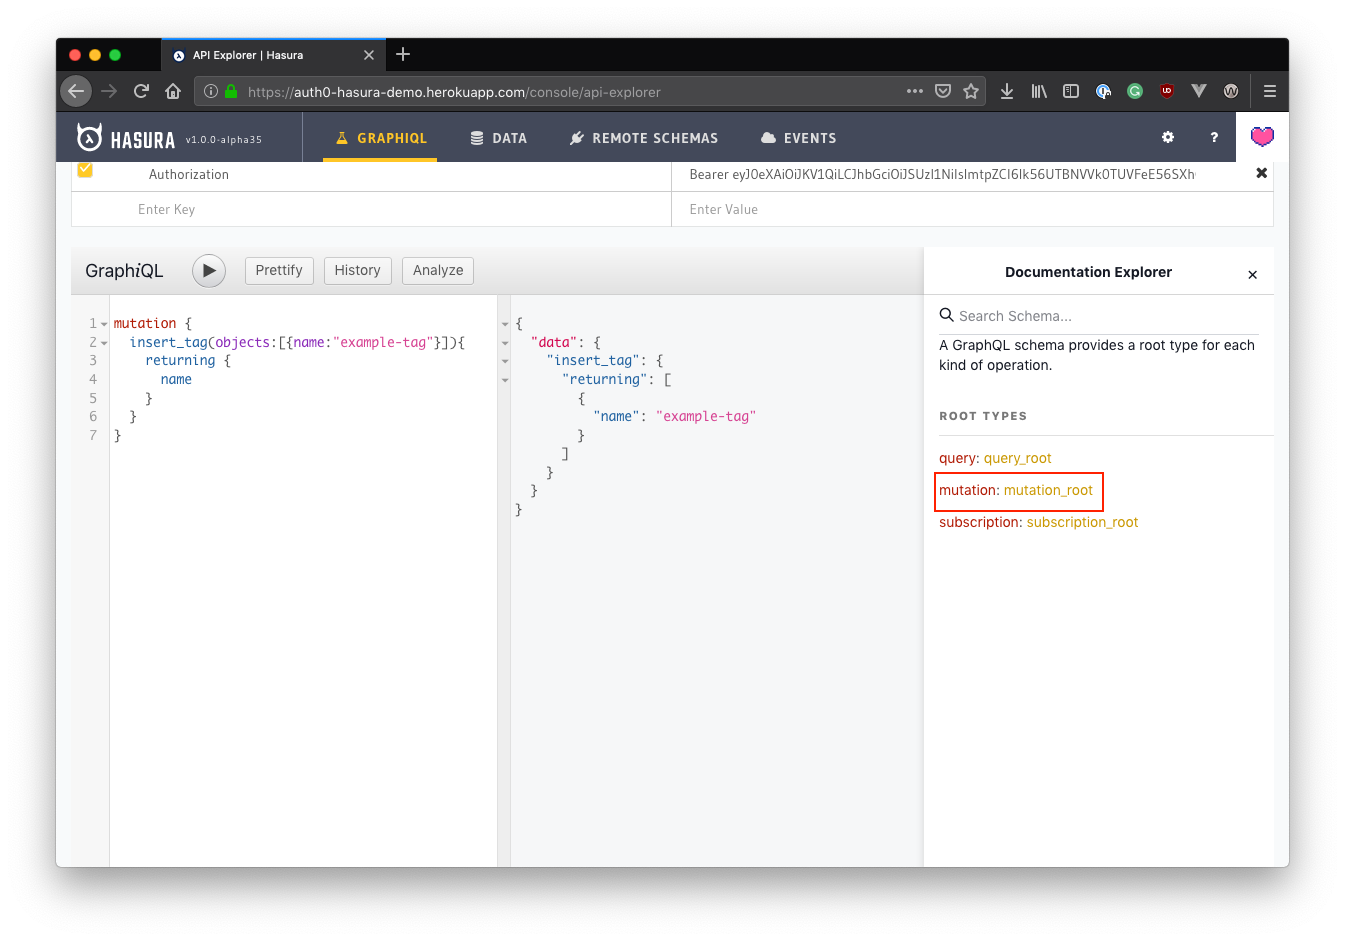 GraphQL API documentation explorer in Hasura showing mutations